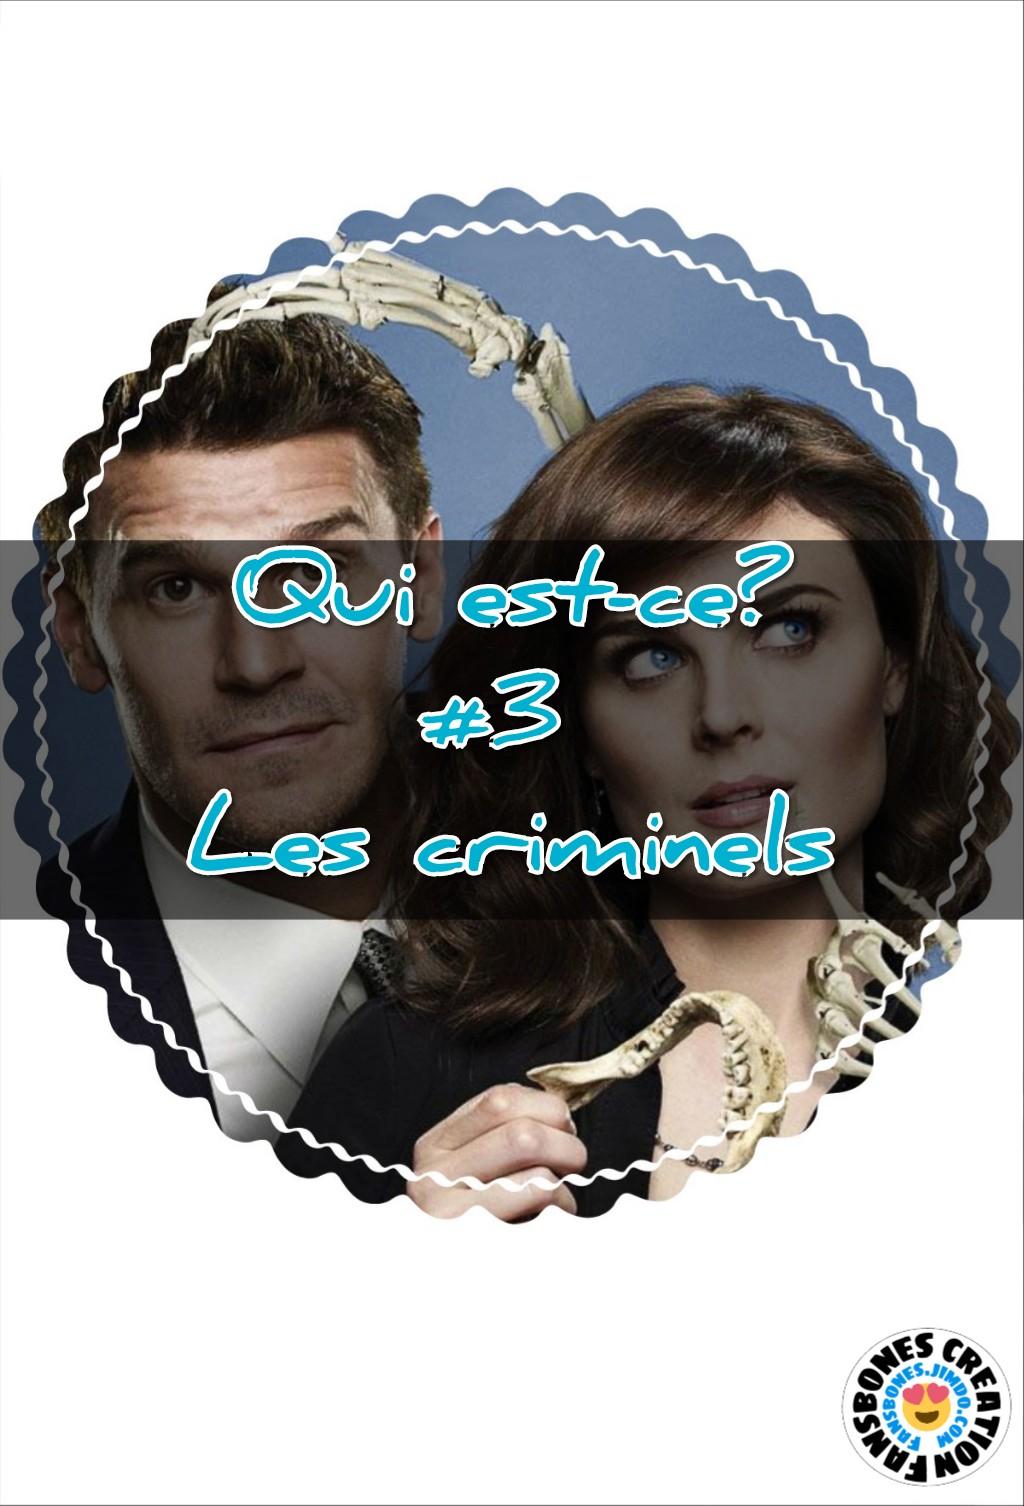 Bones 'Qui est ce ?' #3 «Les criminels»